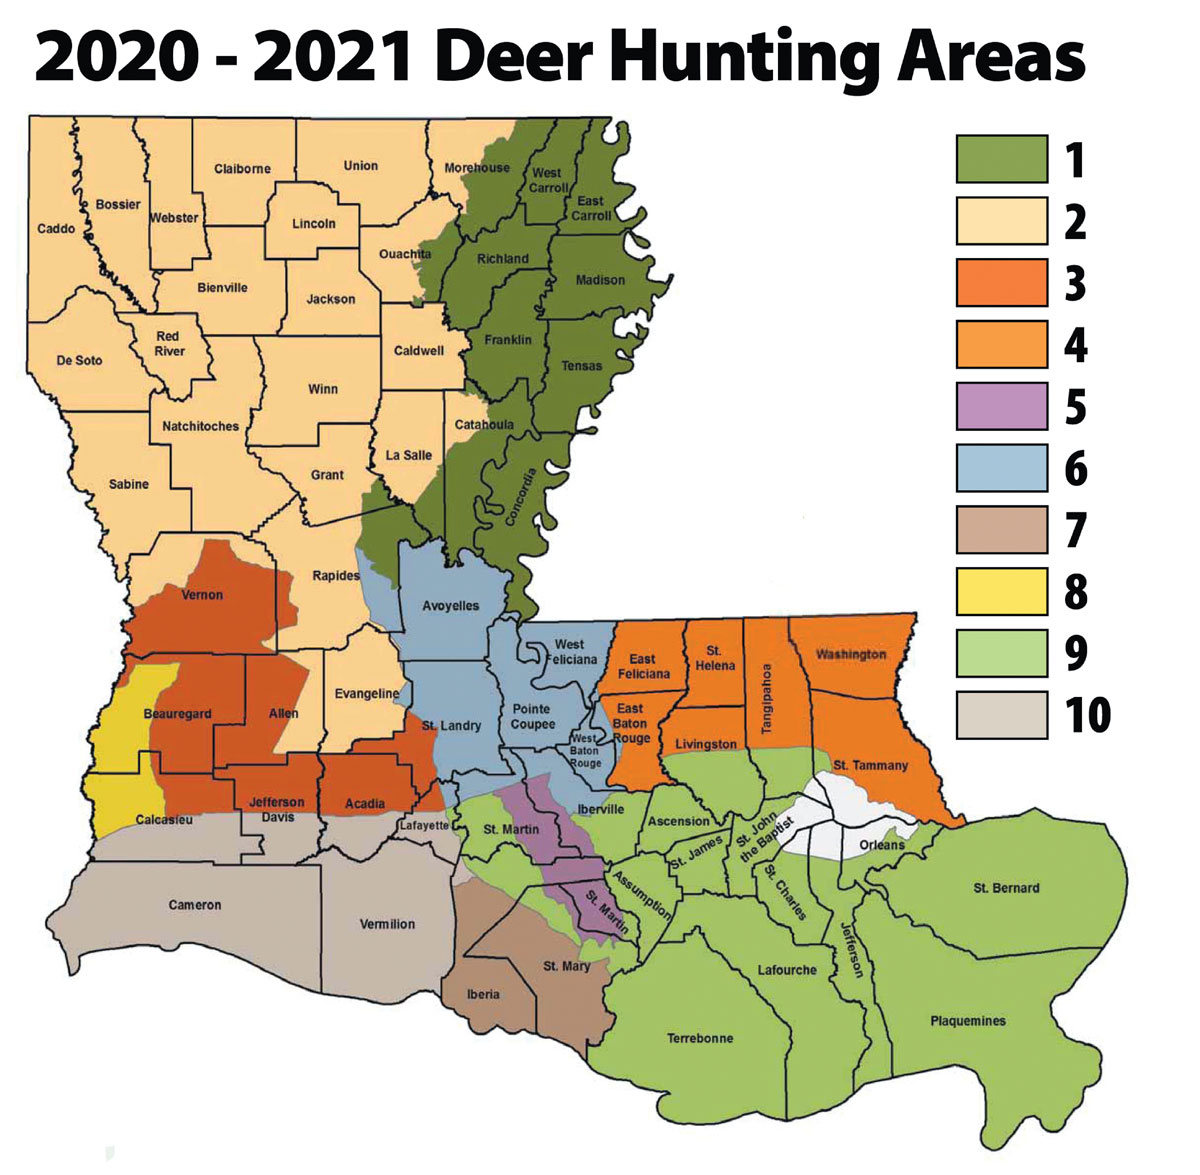 Louisiana'S 2020 Rut Report - Louisiana Sportsman with regard to 2021 Deer Rut Calendar